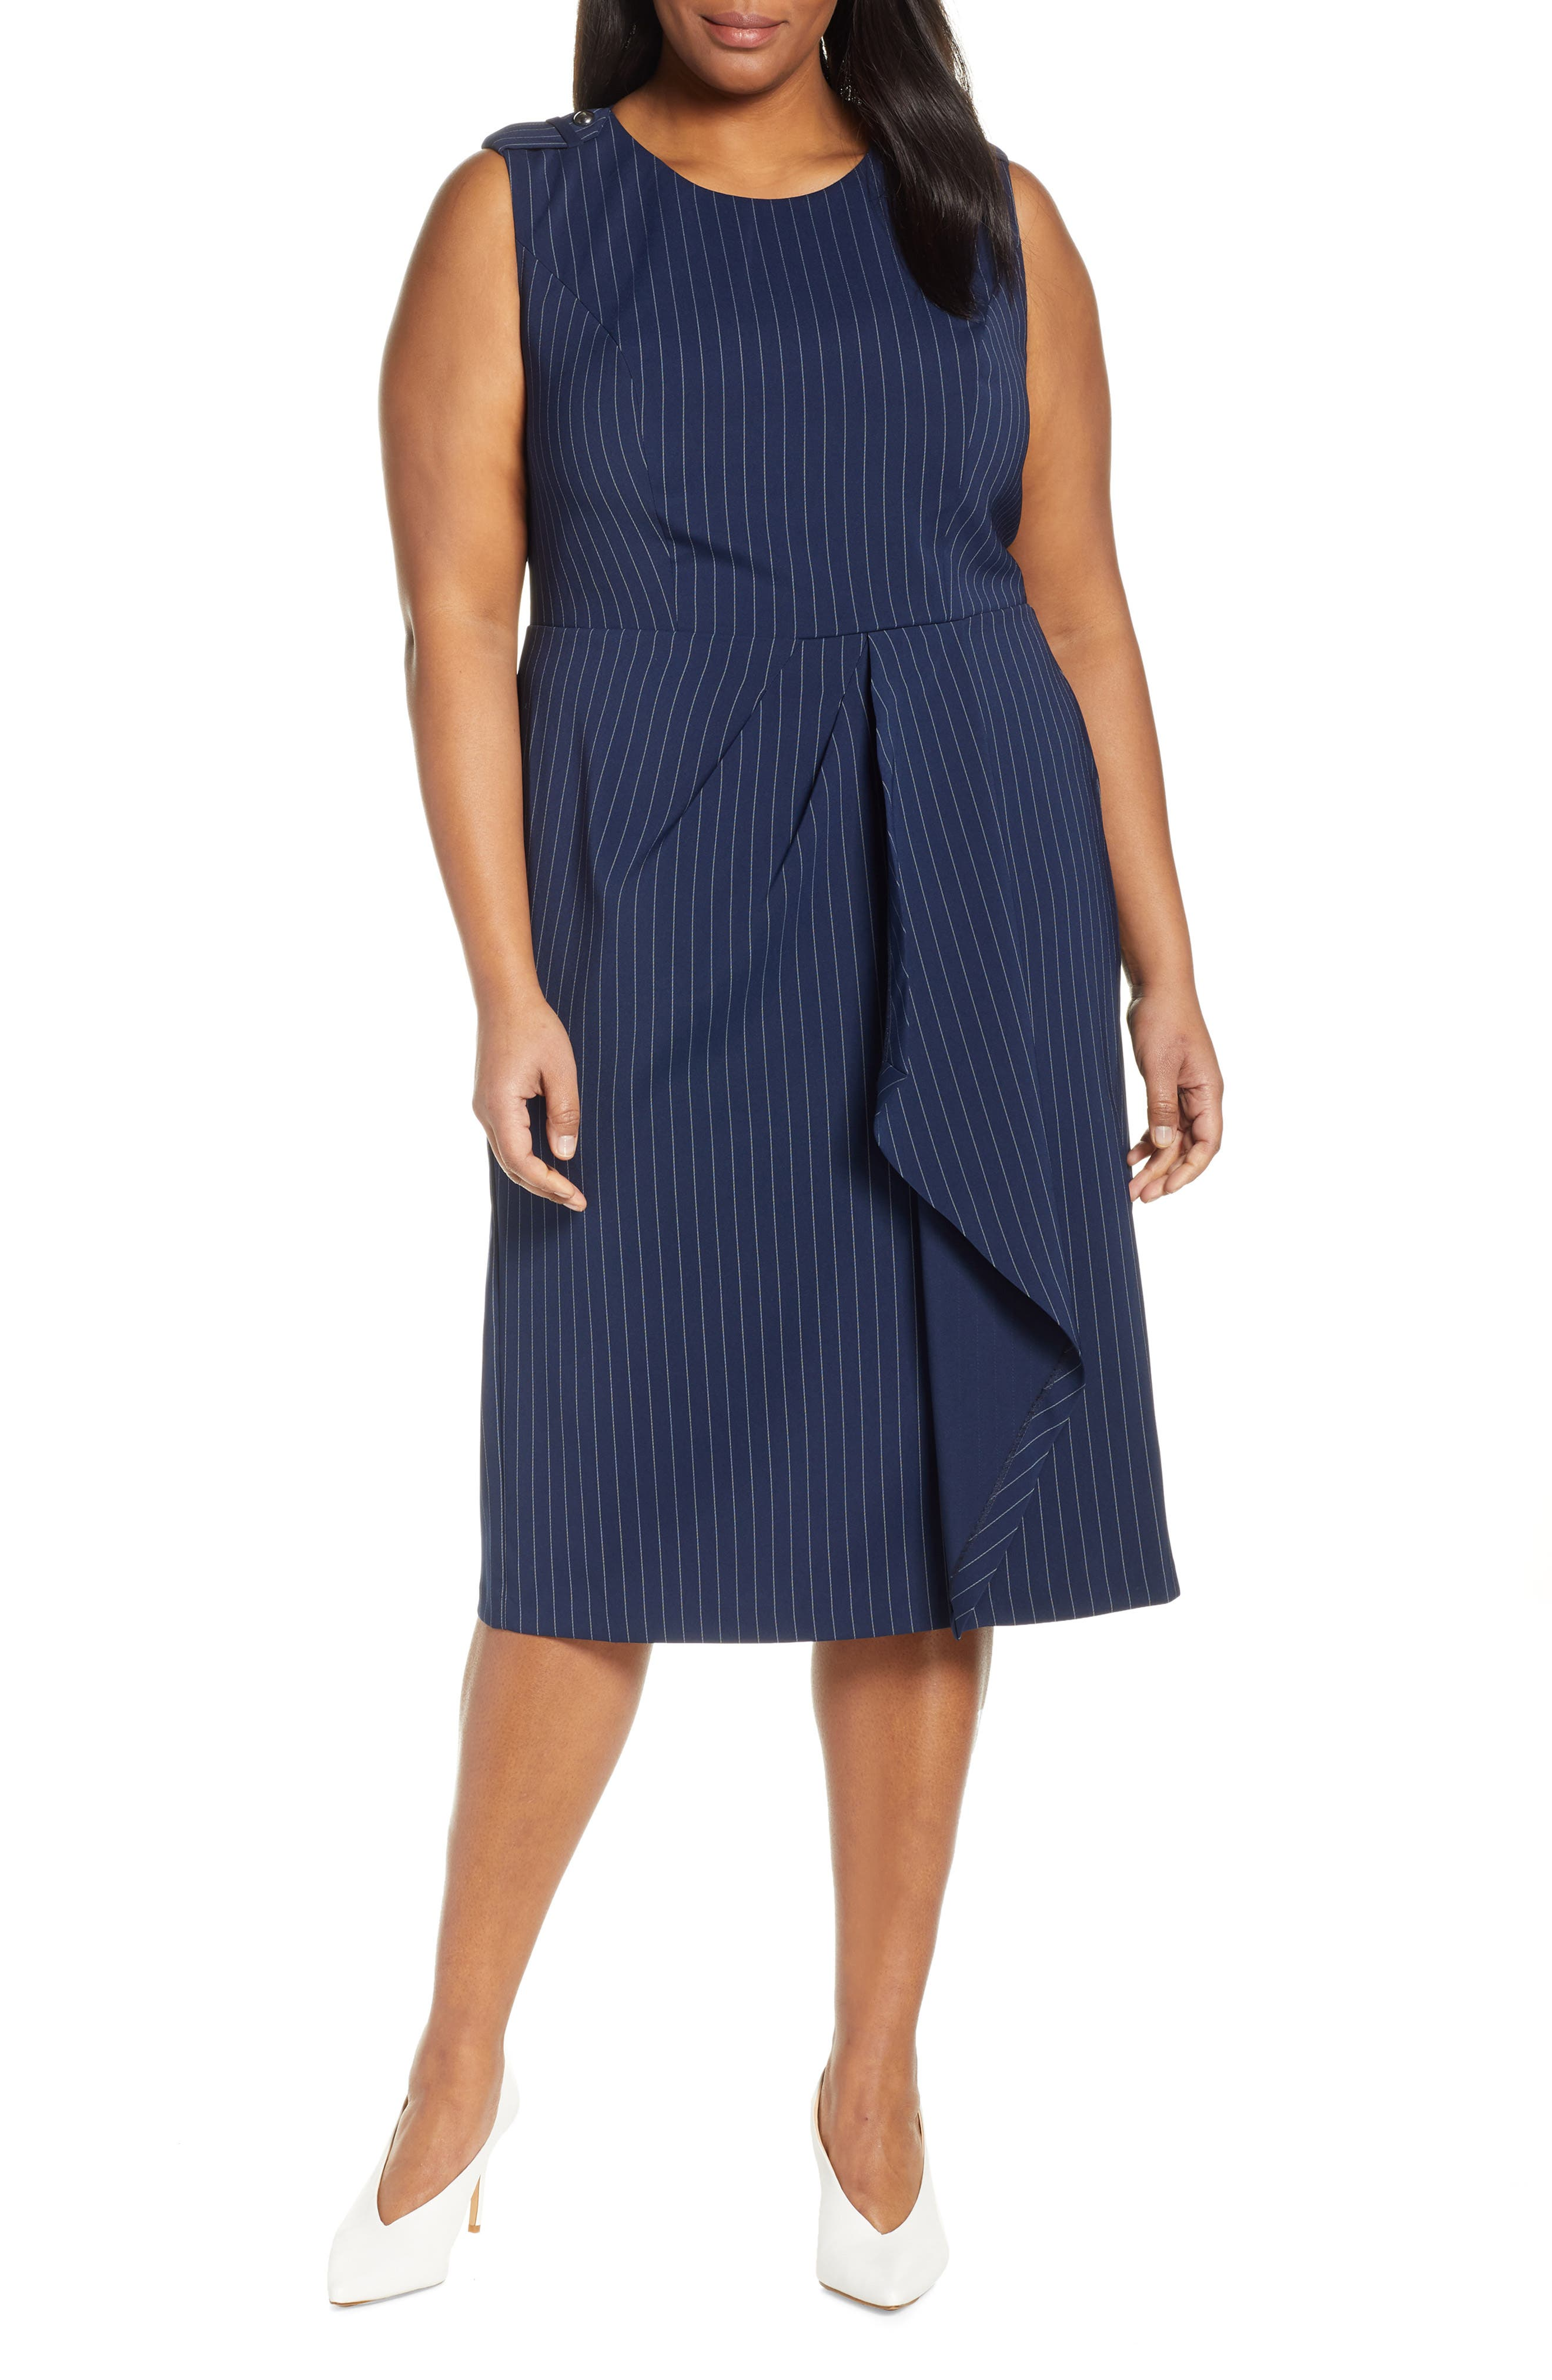 Plus Size Jason Wu X Eloquii Pinstripe Origami Sheath Dress, Blue